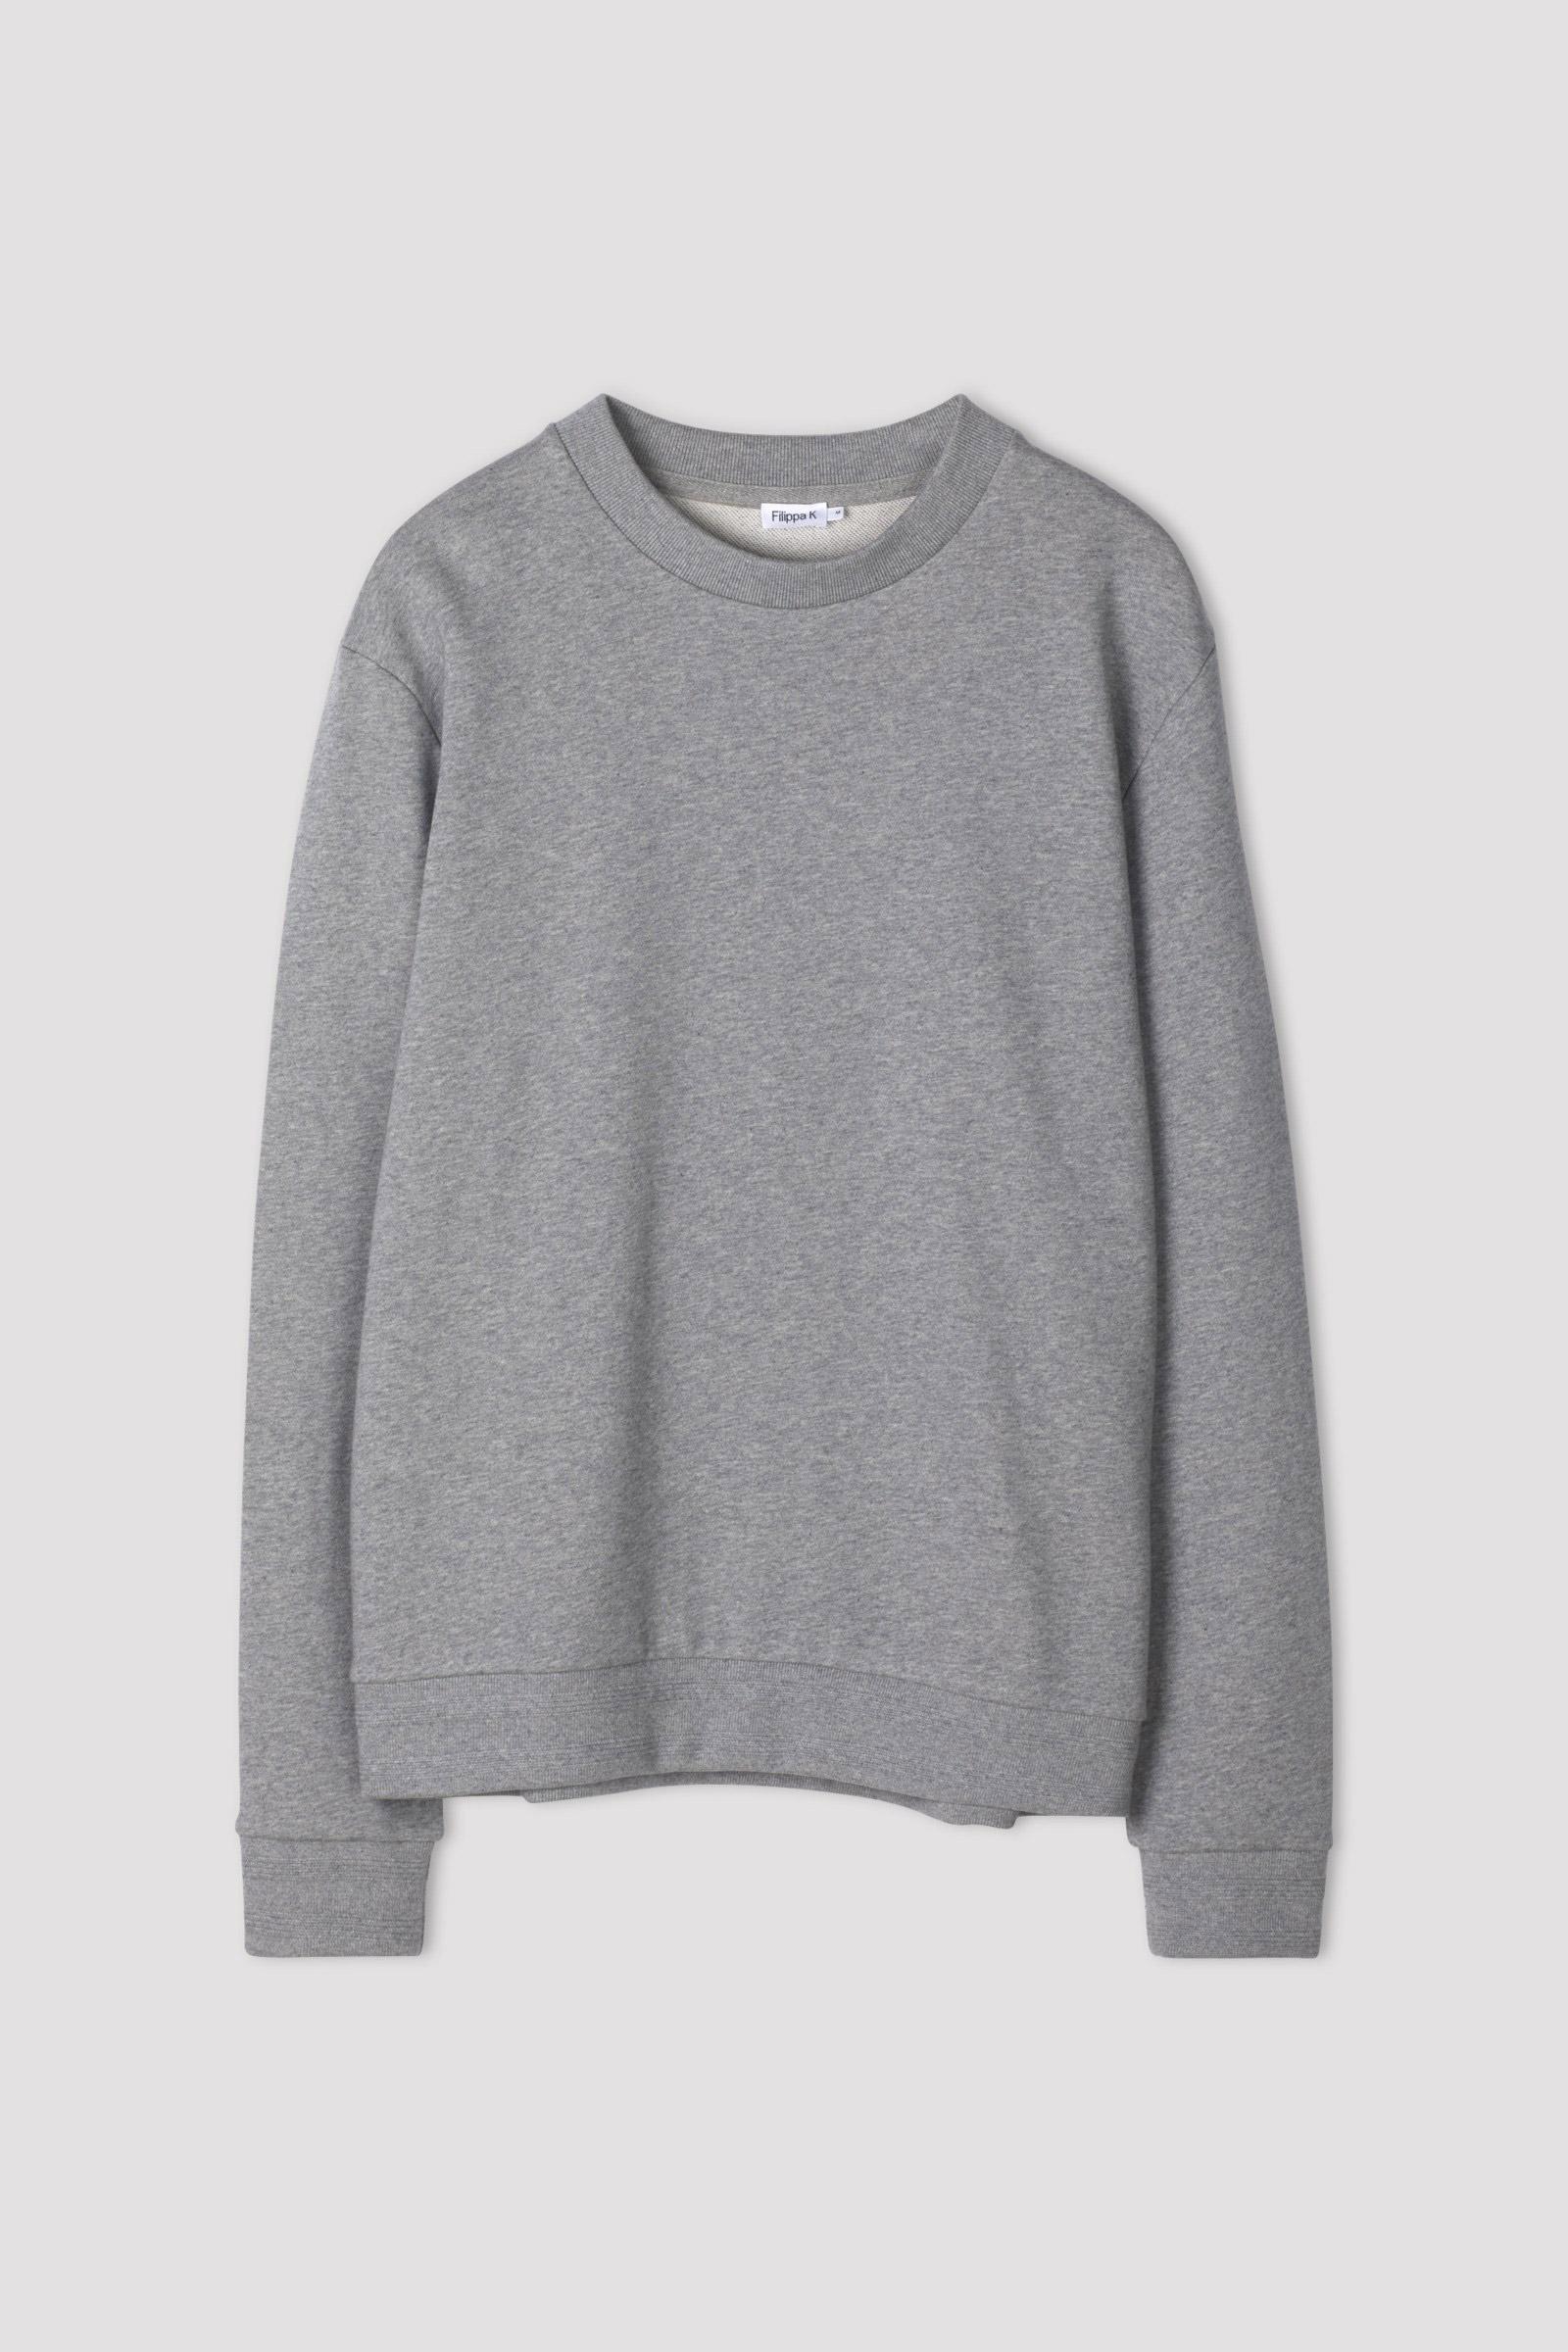 M. Isaac Sweatshirt Grey Melange